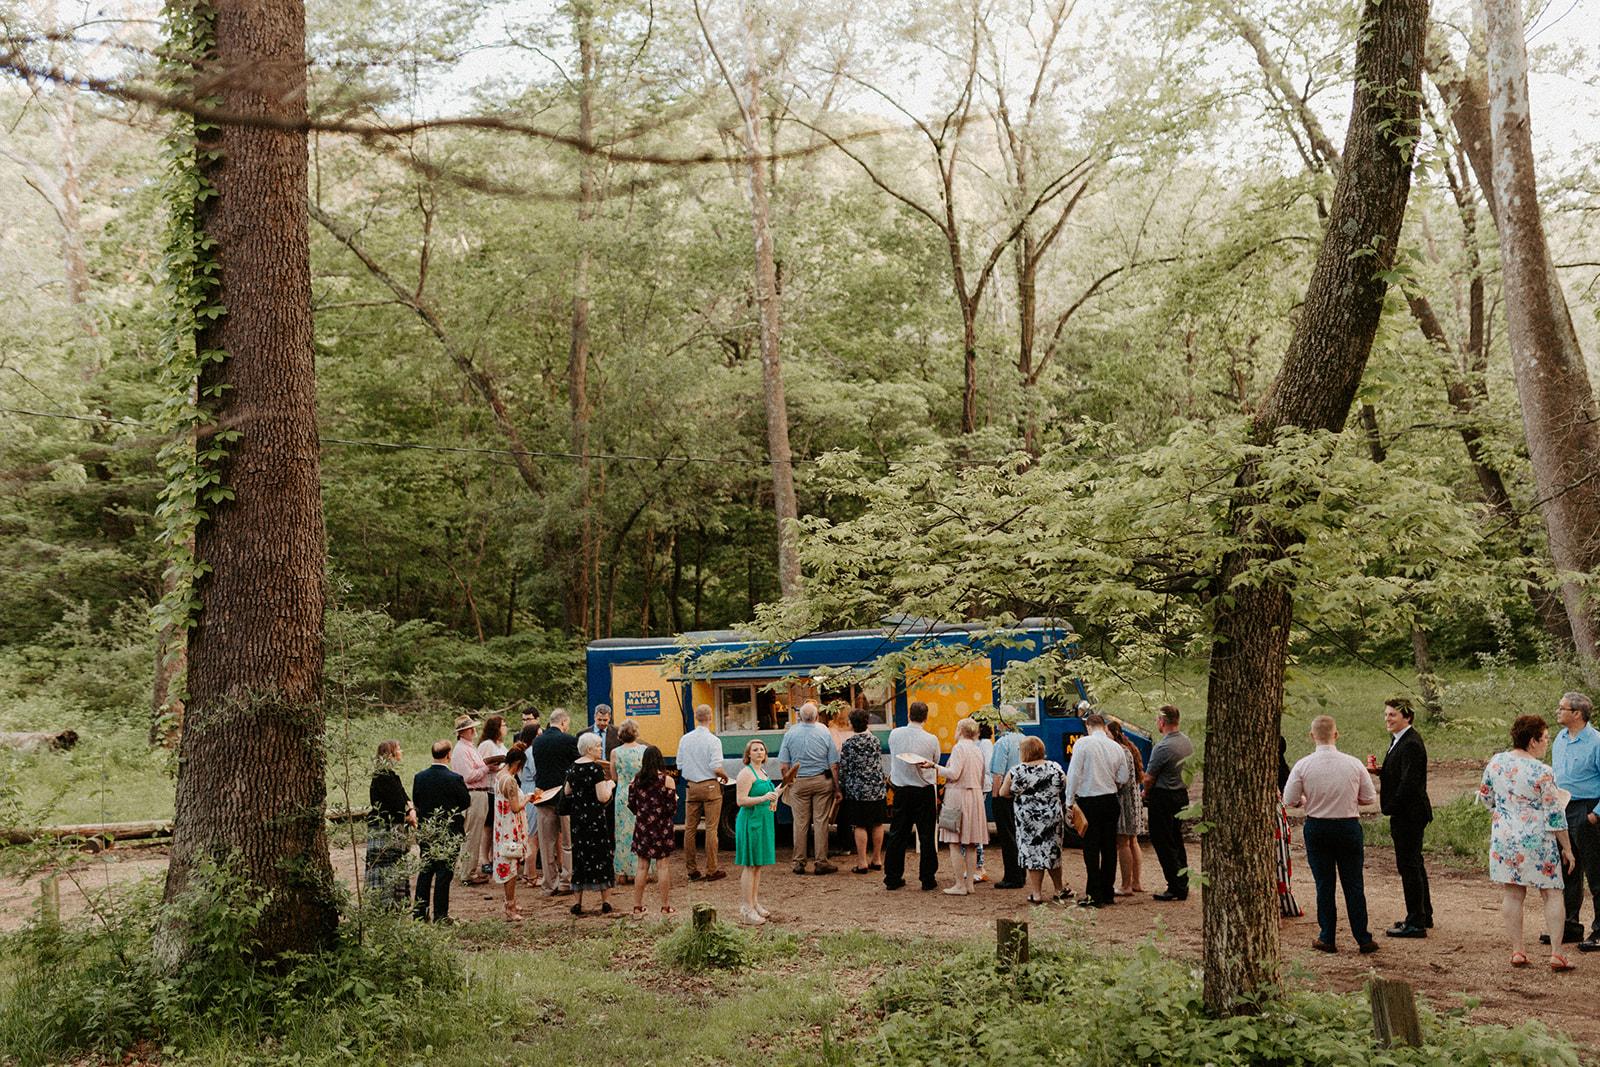 camp_wokanda_peoria_illinois_wedding_photographer_wright_photographs_bliese_0888.jpg